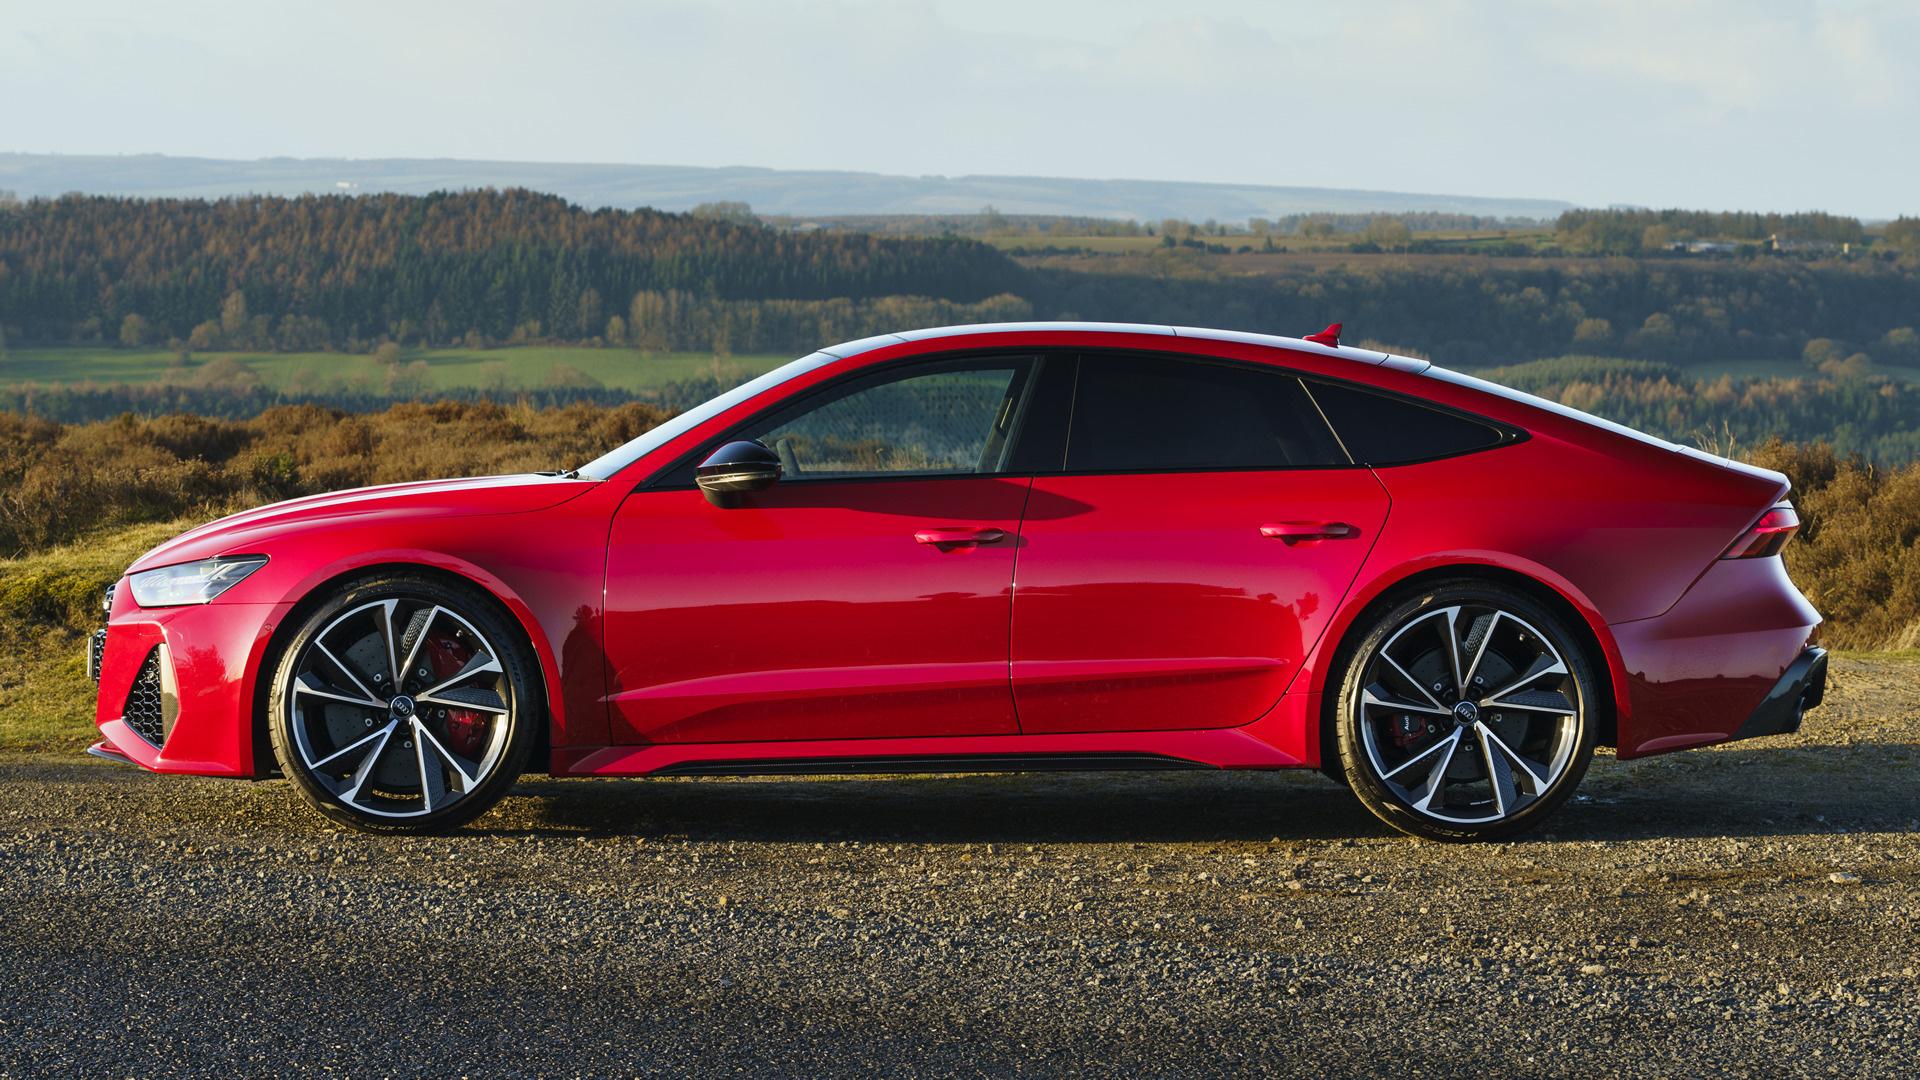 2020 Audi Rs7 Sportback Papel De Parede Hd Plano De Fundo 1920x1080 Id 1070843 Wallpaper Abyss